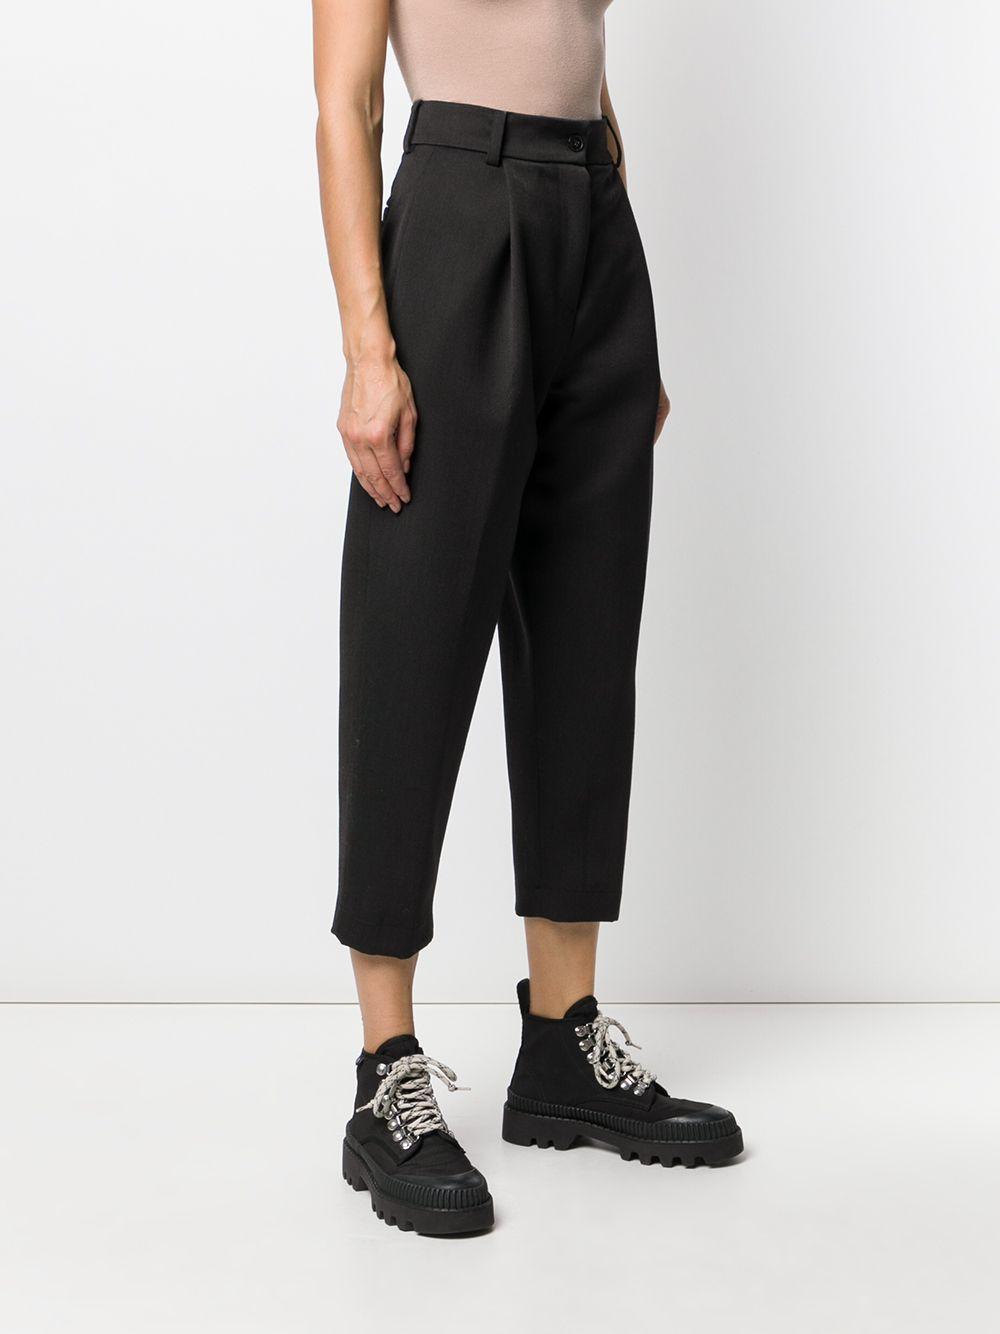 Pantalones tapered capri Danielapi de Lana de color Negro